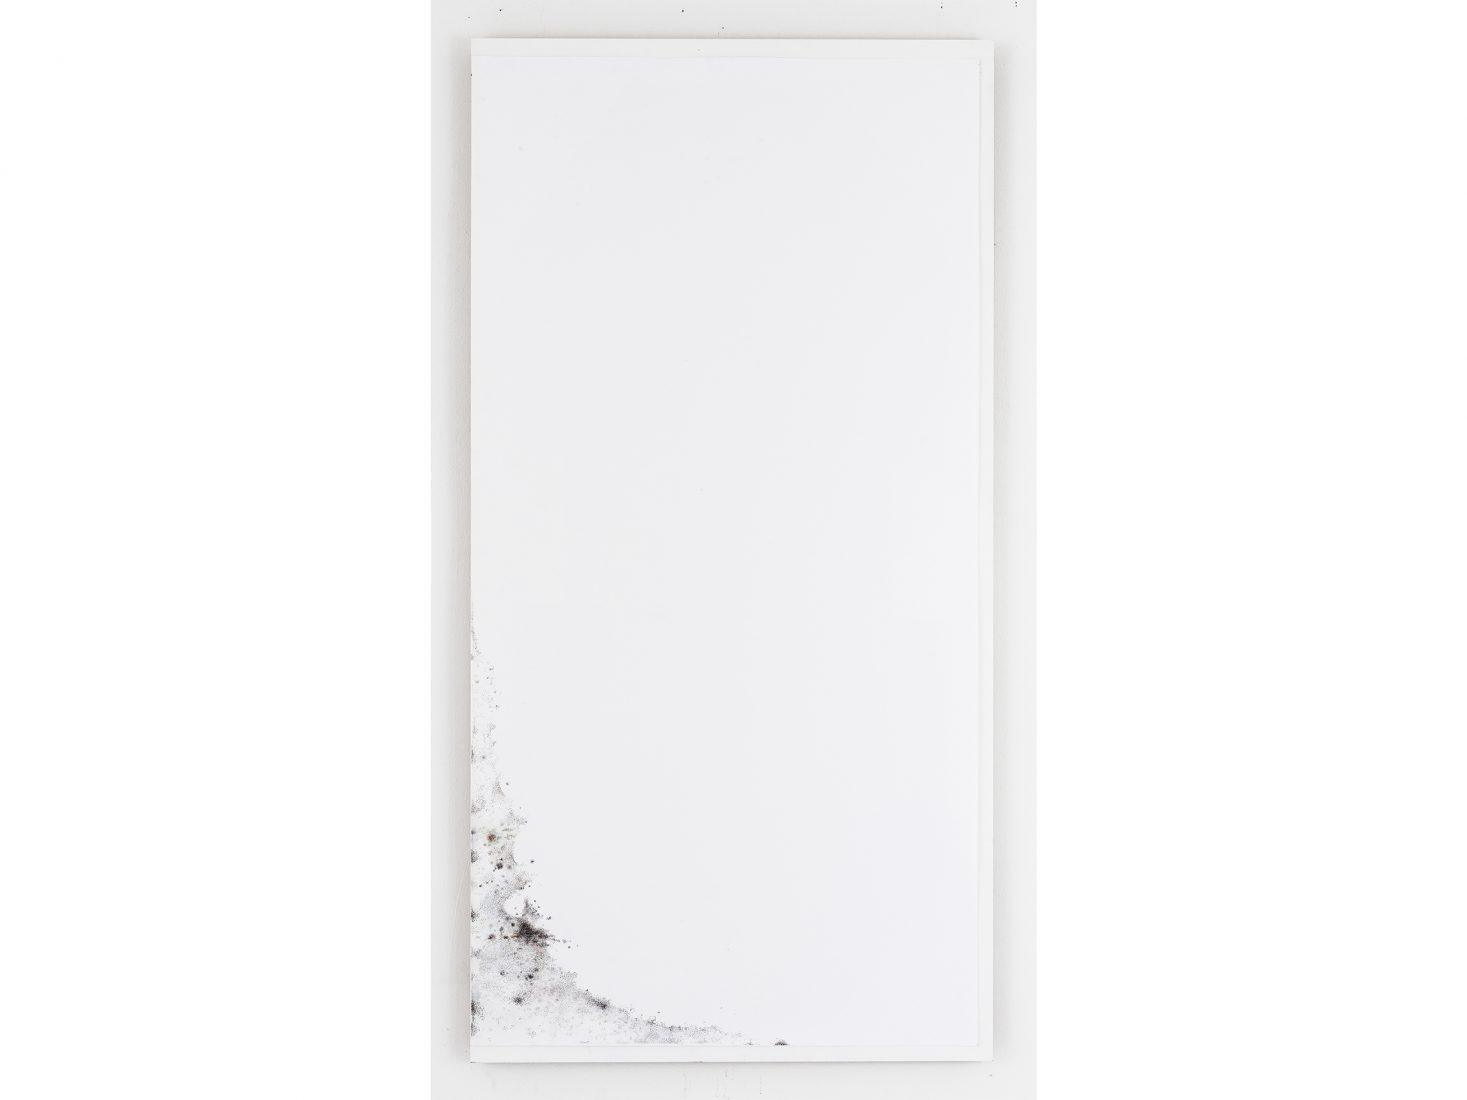 Michail Michailov. Mold (Dust to Dust)#4, 2020, coloured pencil on paper, 138x96 cm